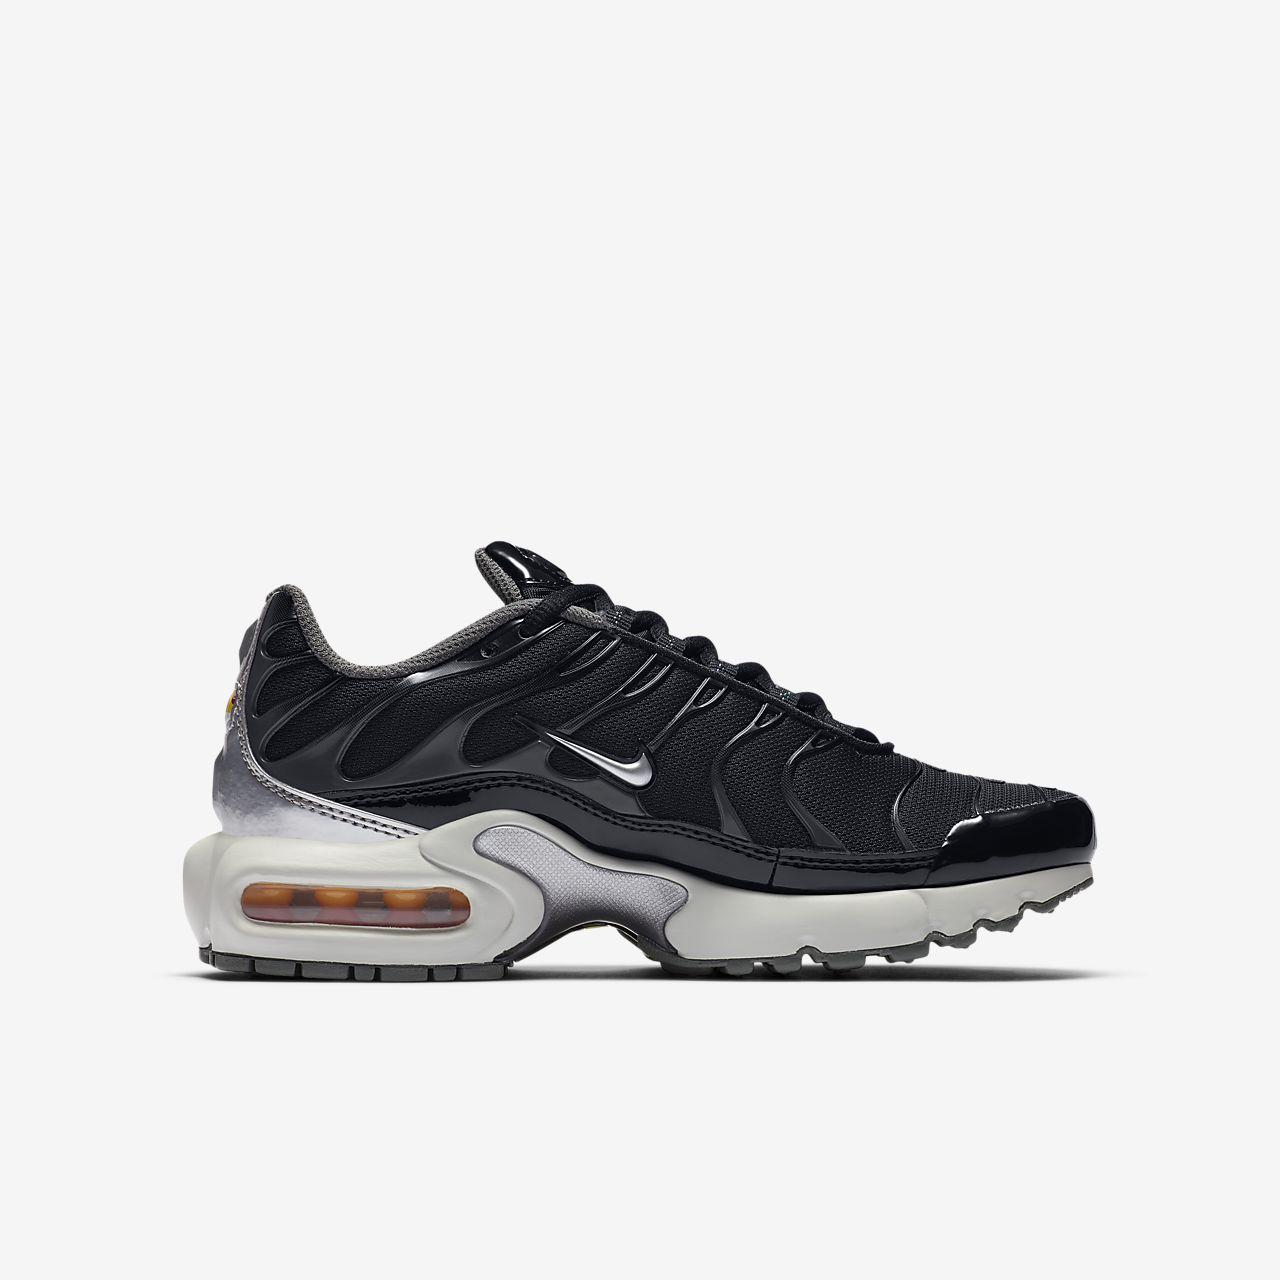 online store 90034 a97a3 ... Nike Air Max Plus Y2K sko til store barn